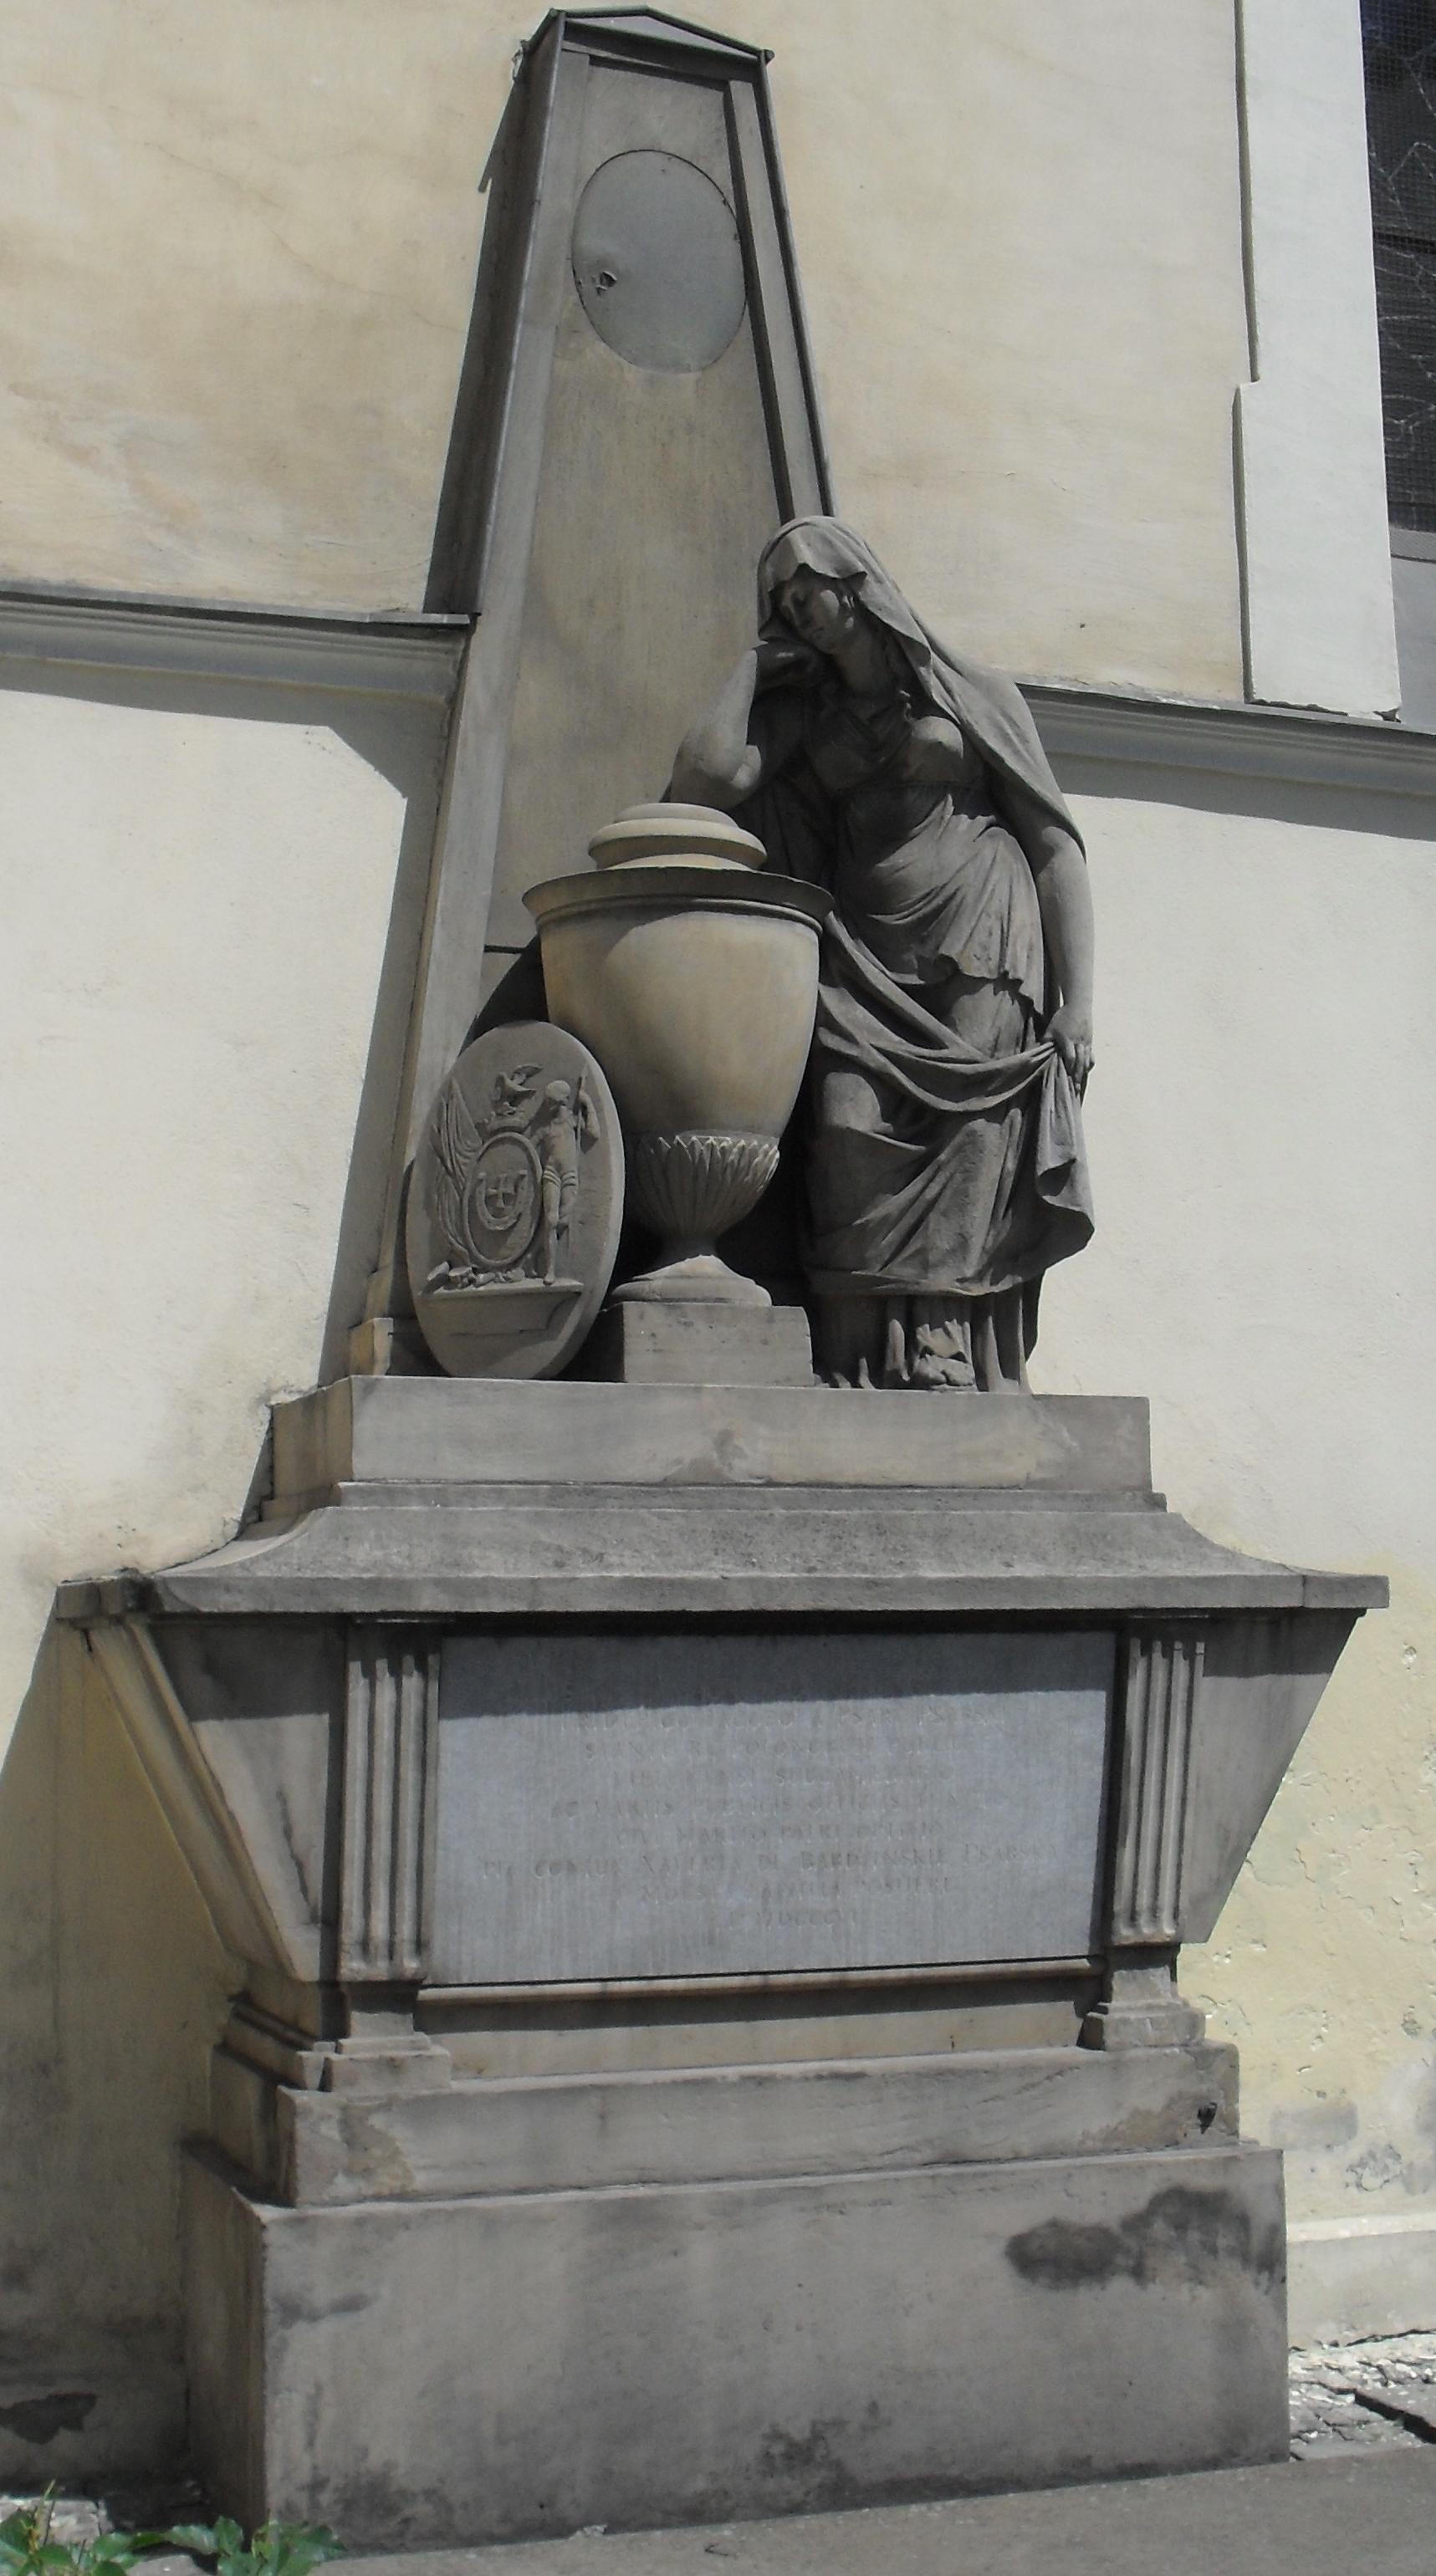 comte augusto curso de filosofia positiva